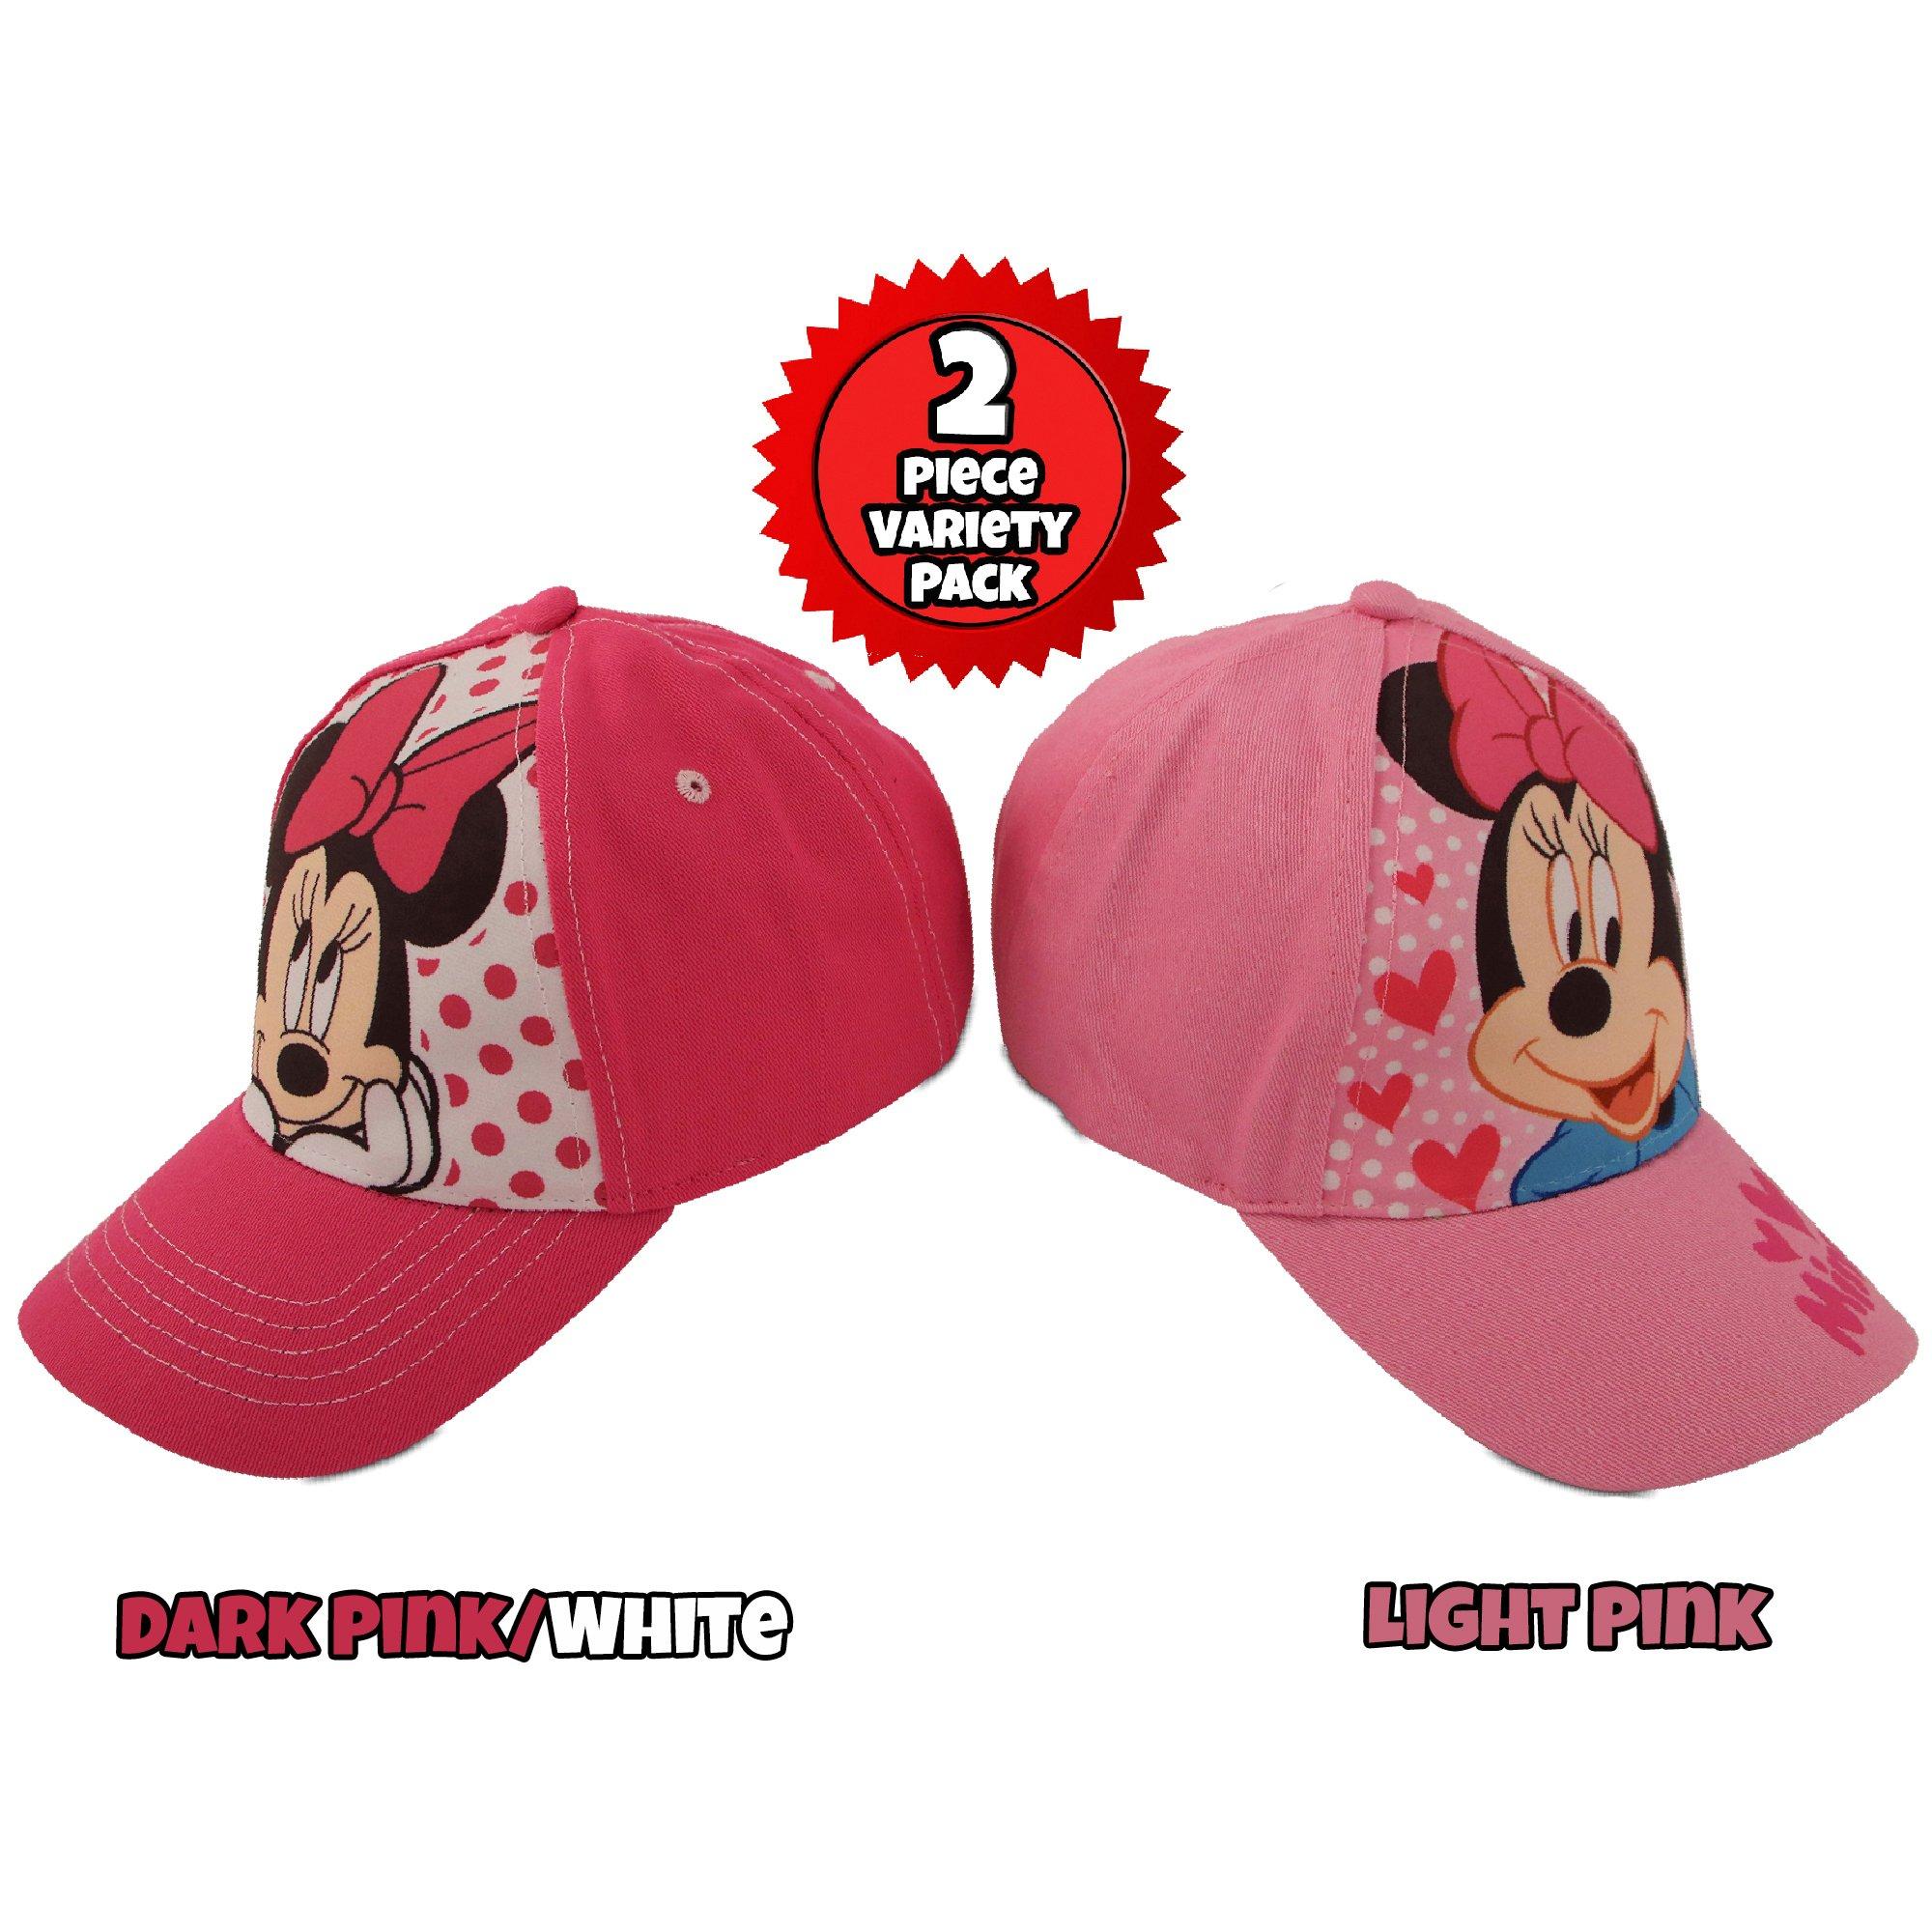 Disney Little Girls Assorted Character Cotton Baseball Cap, 2 Piece Design Set, Age 2-7 (Toddler Girls – Age 2-4 – 51CM, Minnie Mouse Design – 2 Piece Set)